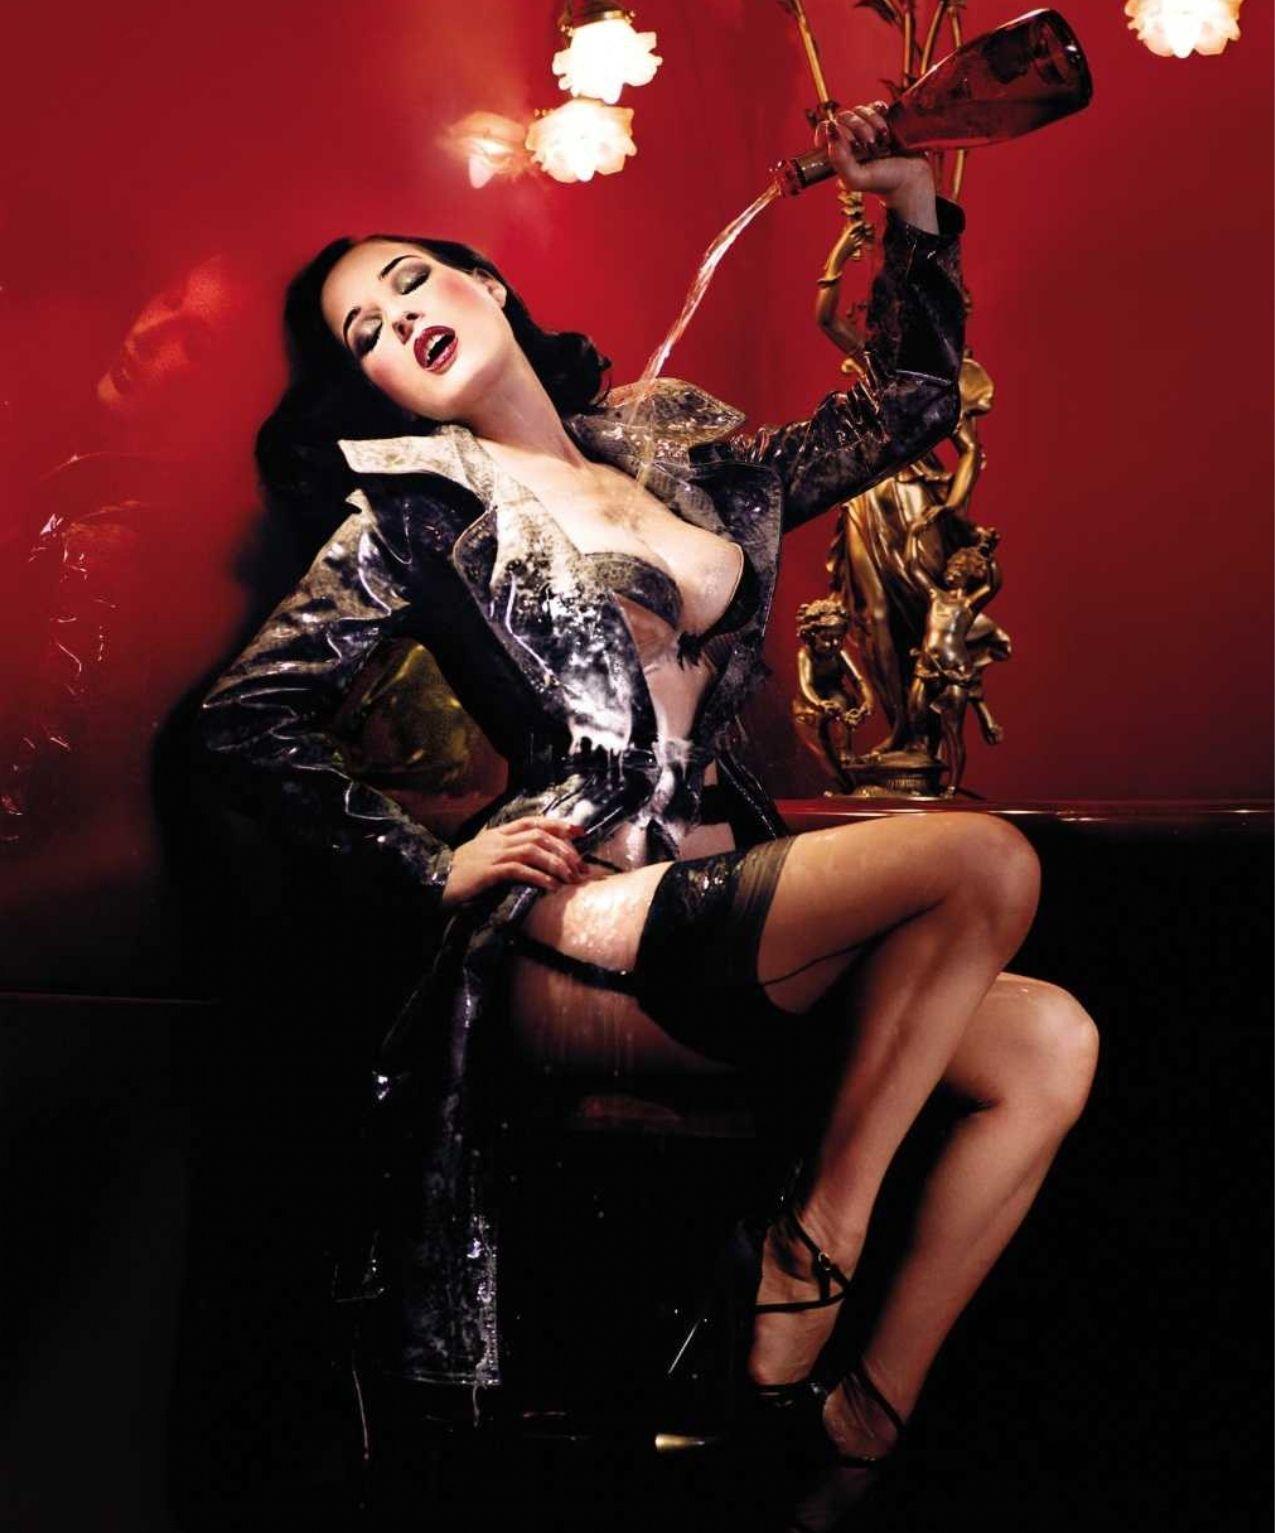 Dita Von Hot Photoshoot For Magazine Pictures Photos